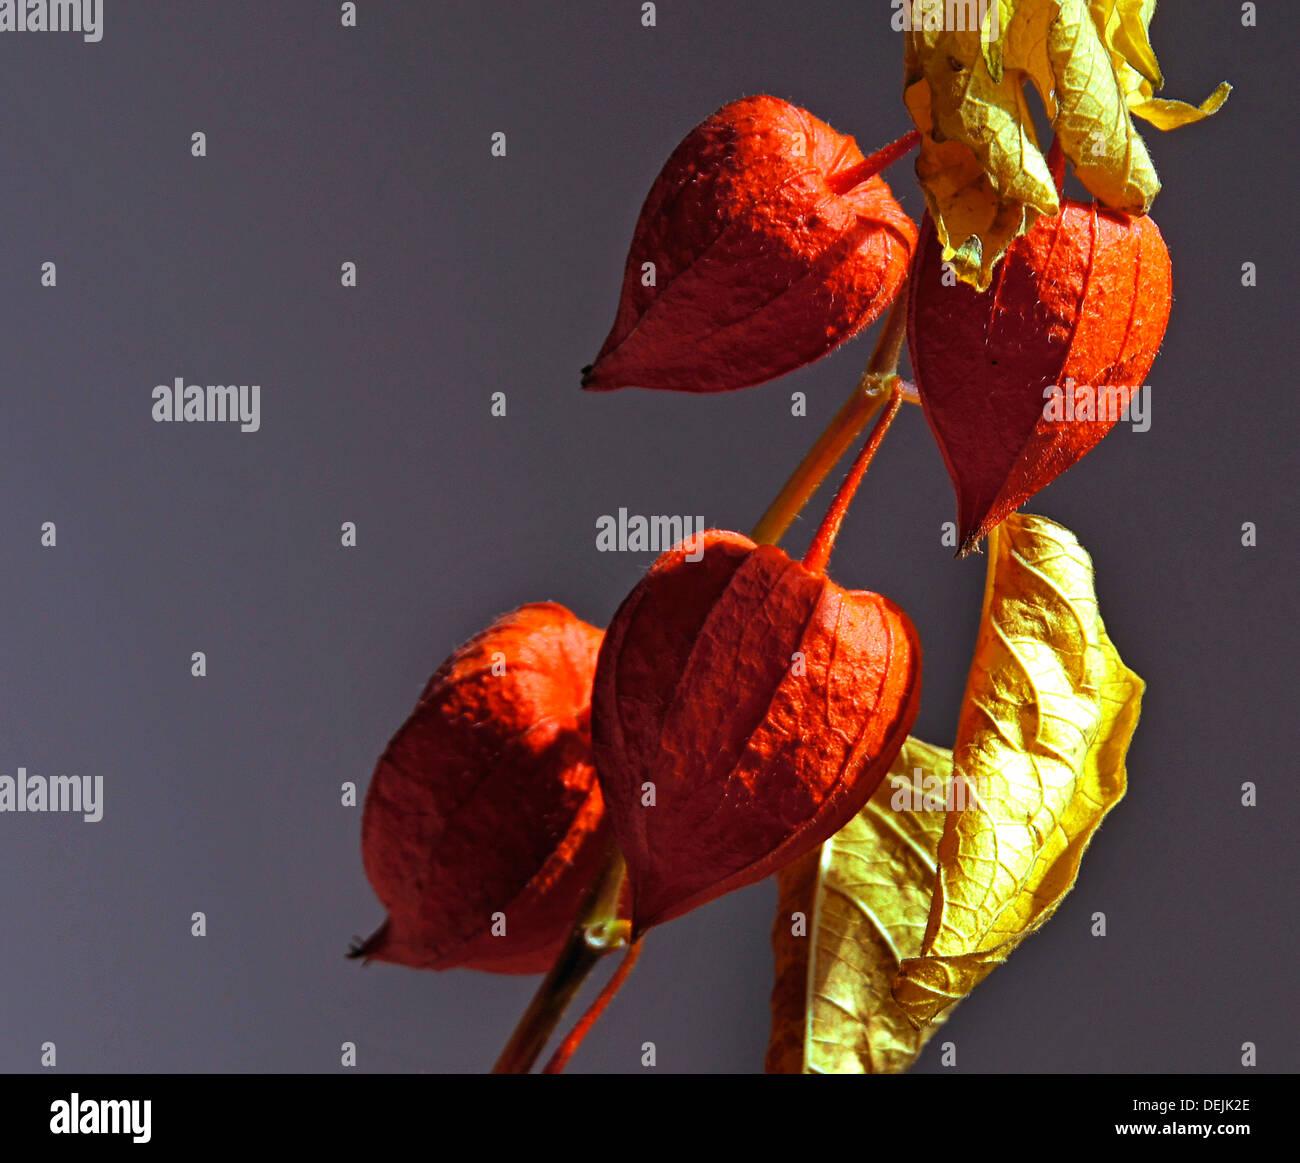 Dry flowers, decoration - Stock Image